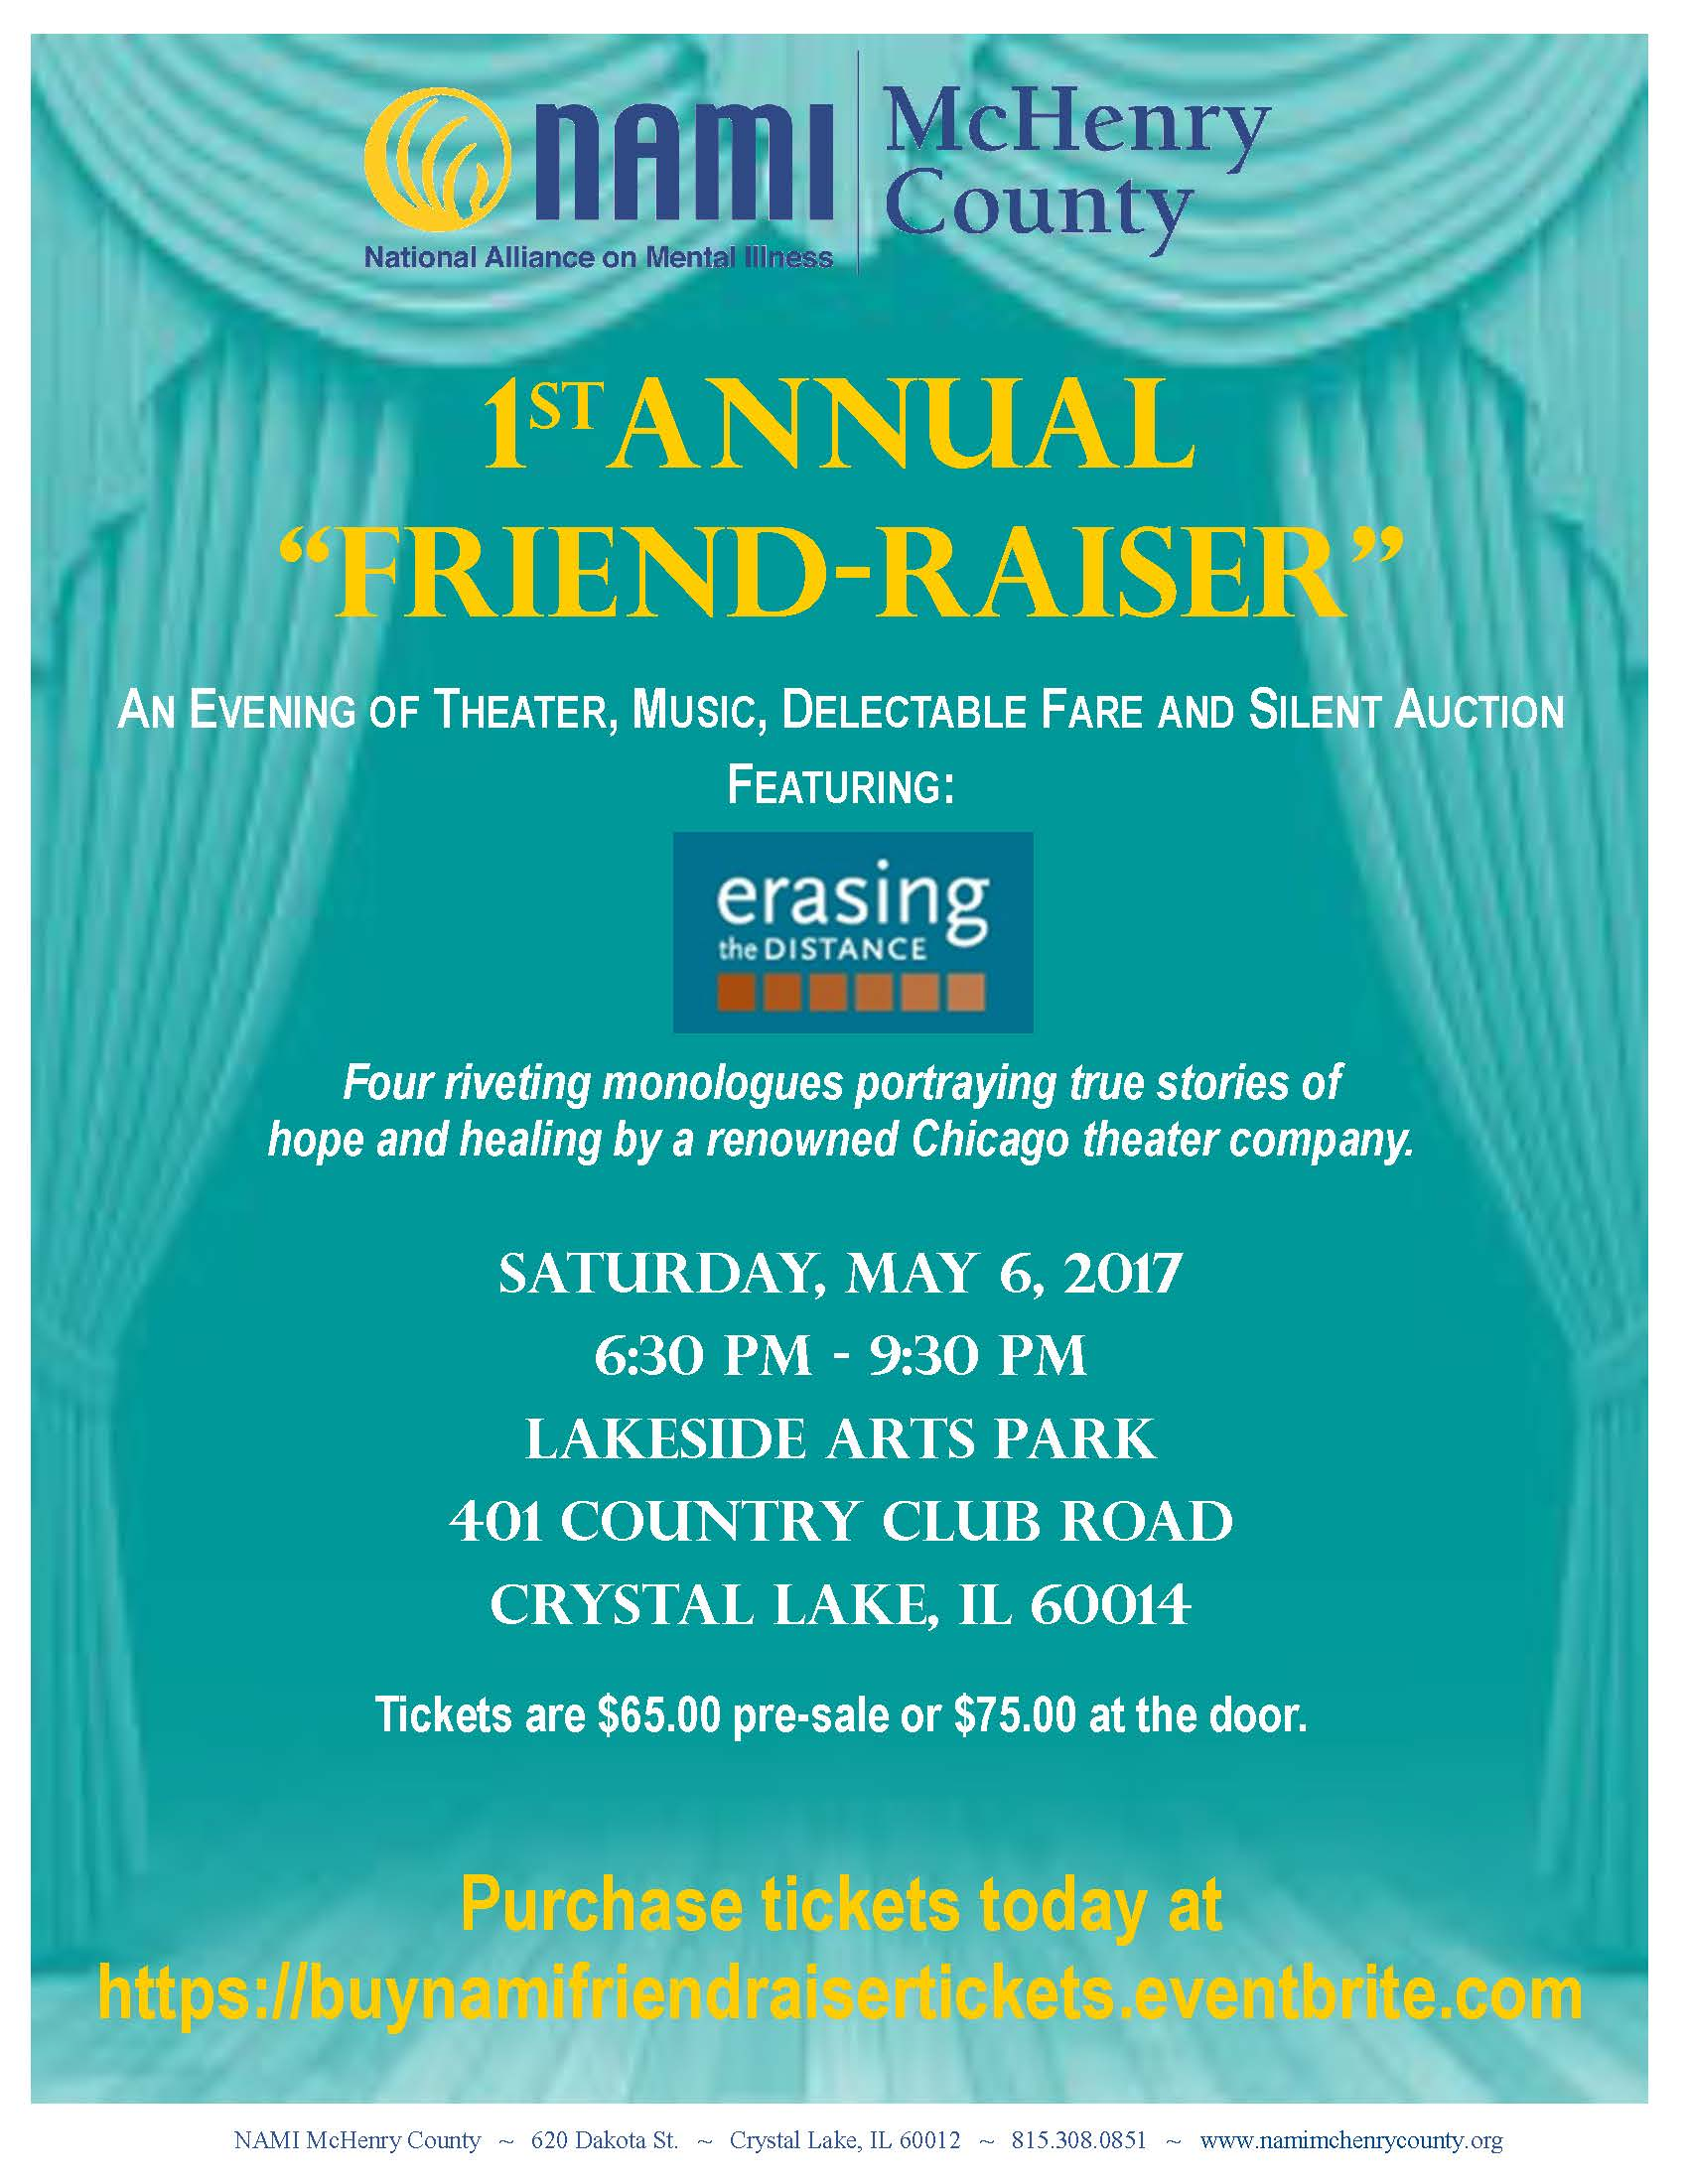 Fundraiser flyer 021317 vqug0z